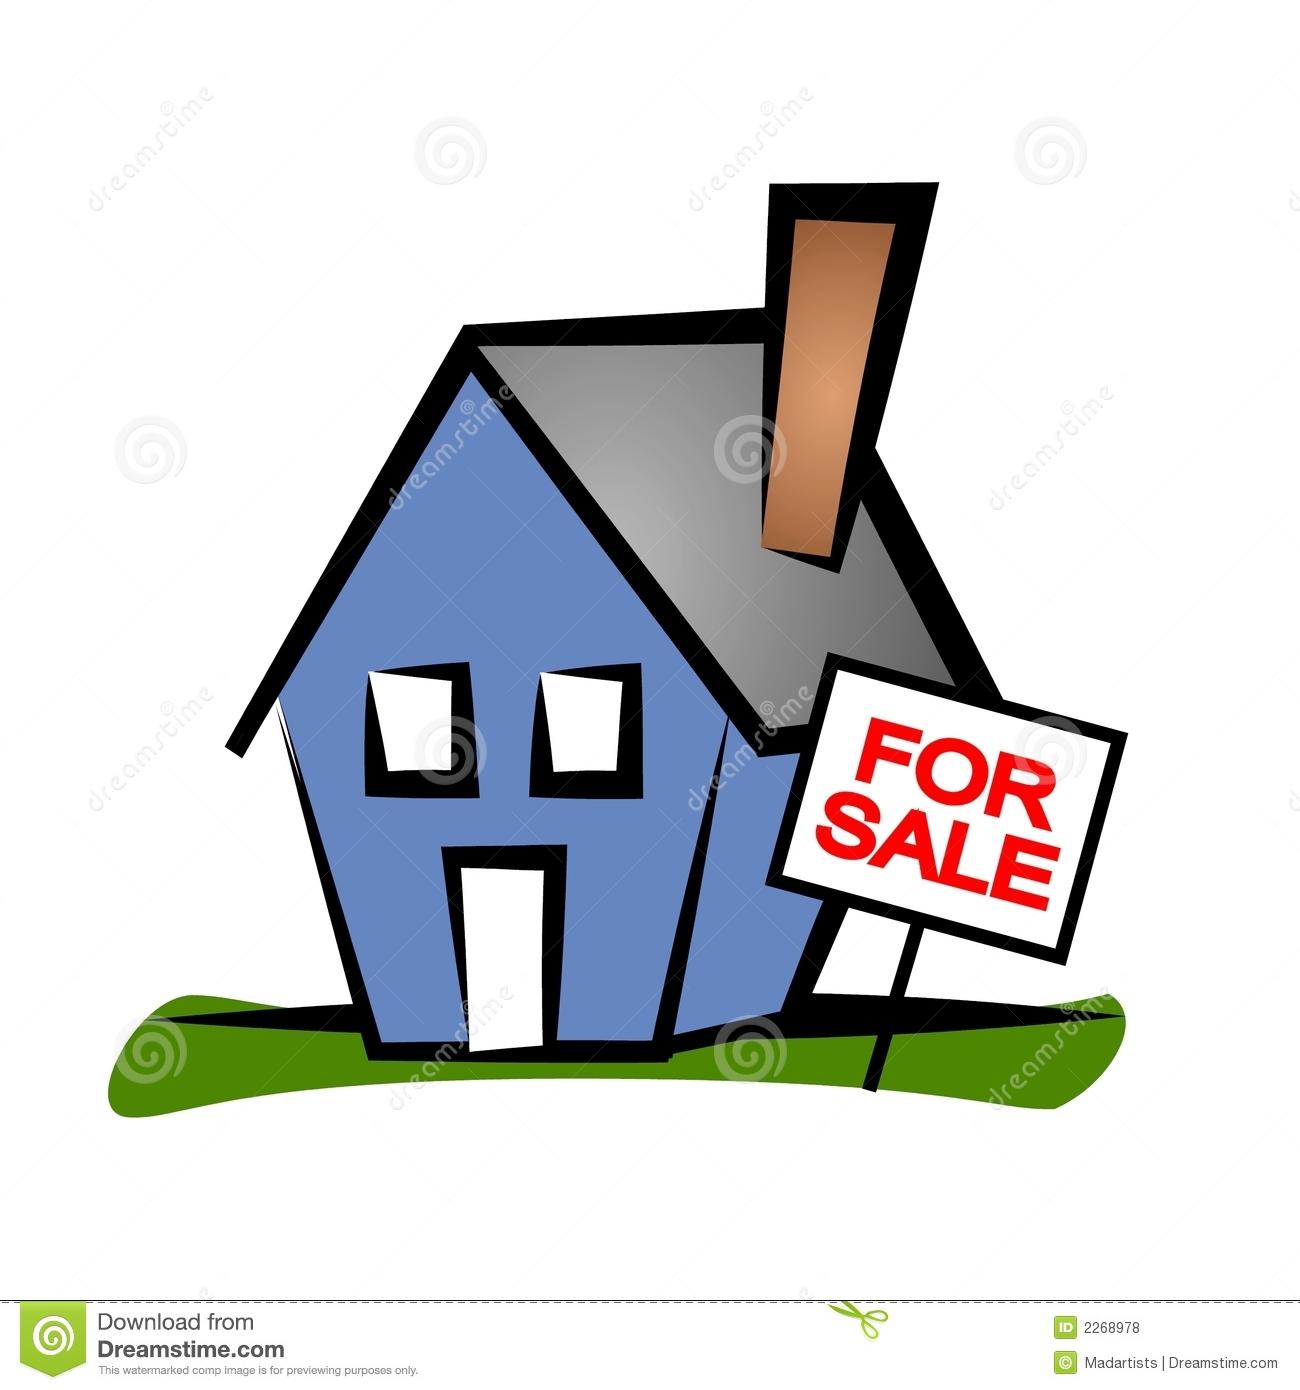 Real Estate Clip Art House 2 Royalty Free Stock Photos